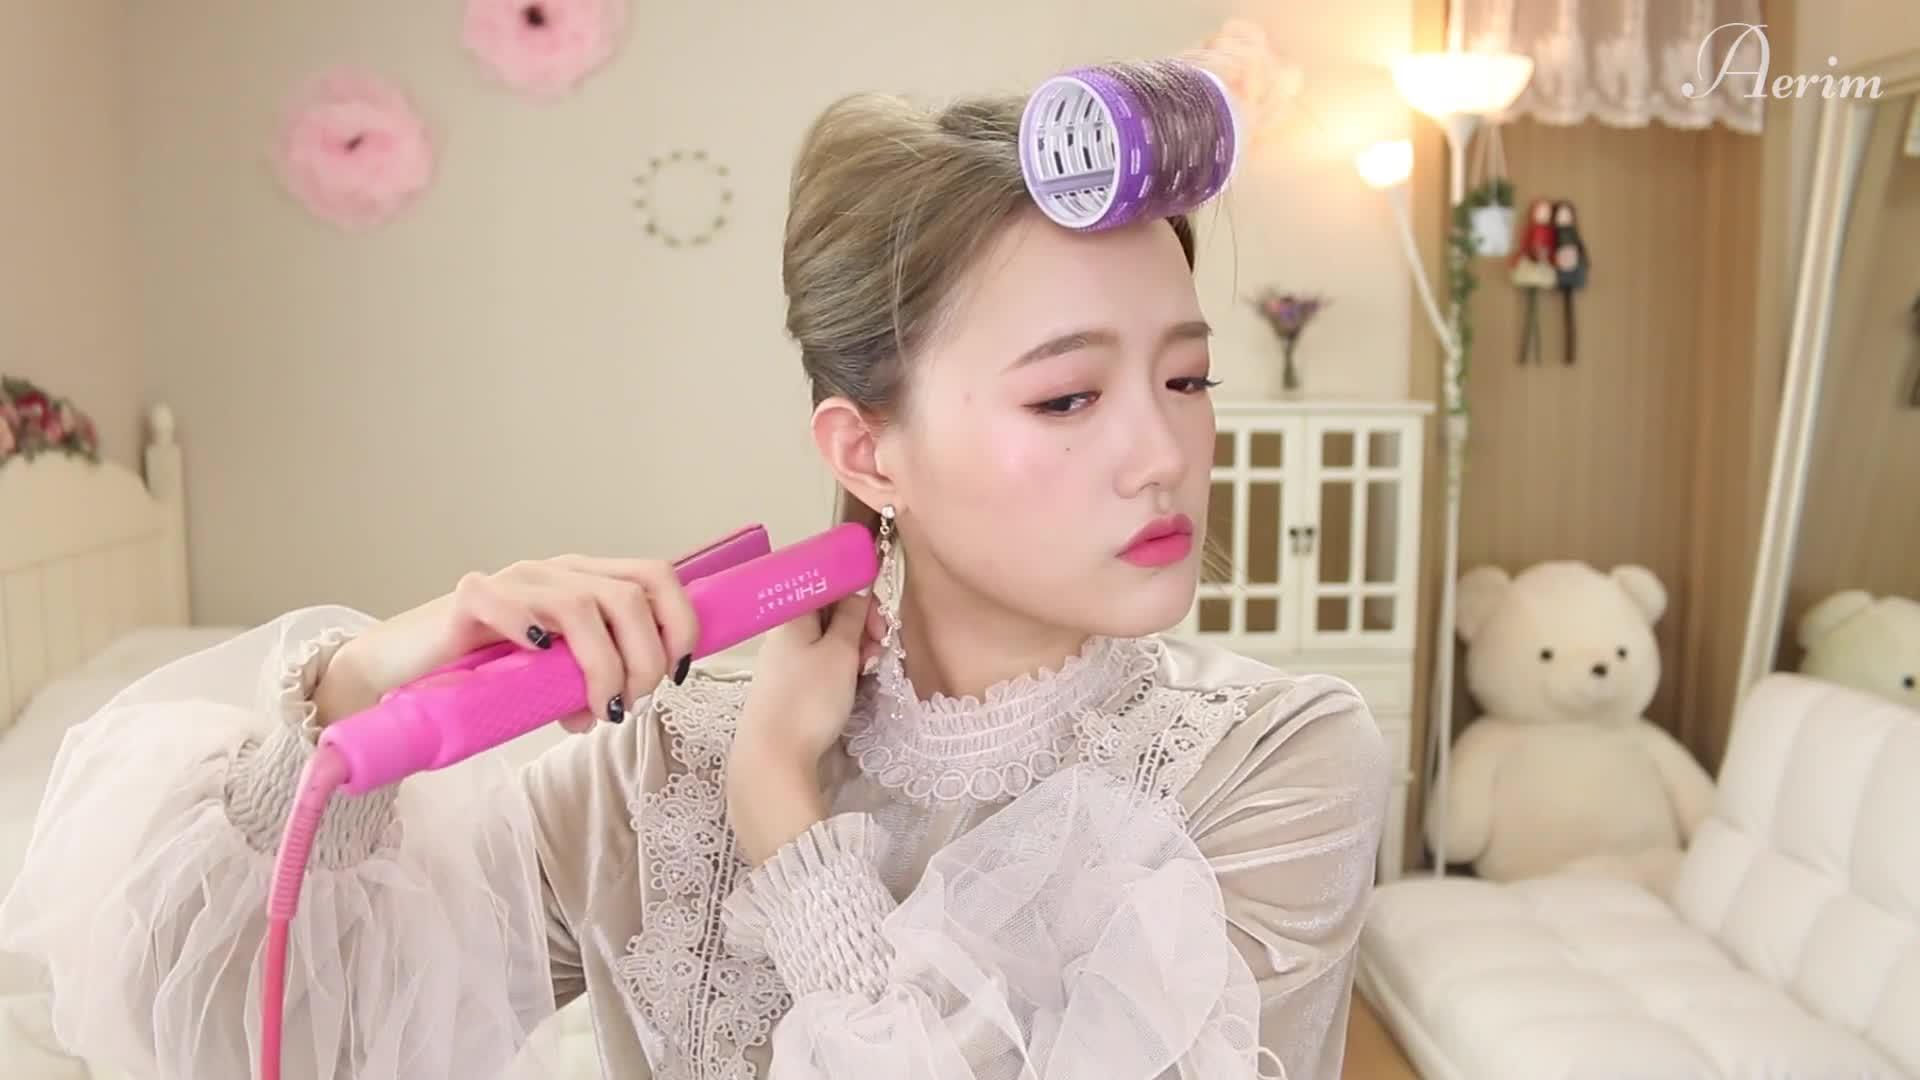 [HAIR] 매일하는 자연스러운 S컬 단발 고데기 feat.앞머리 자연스럽게 넘기는법!